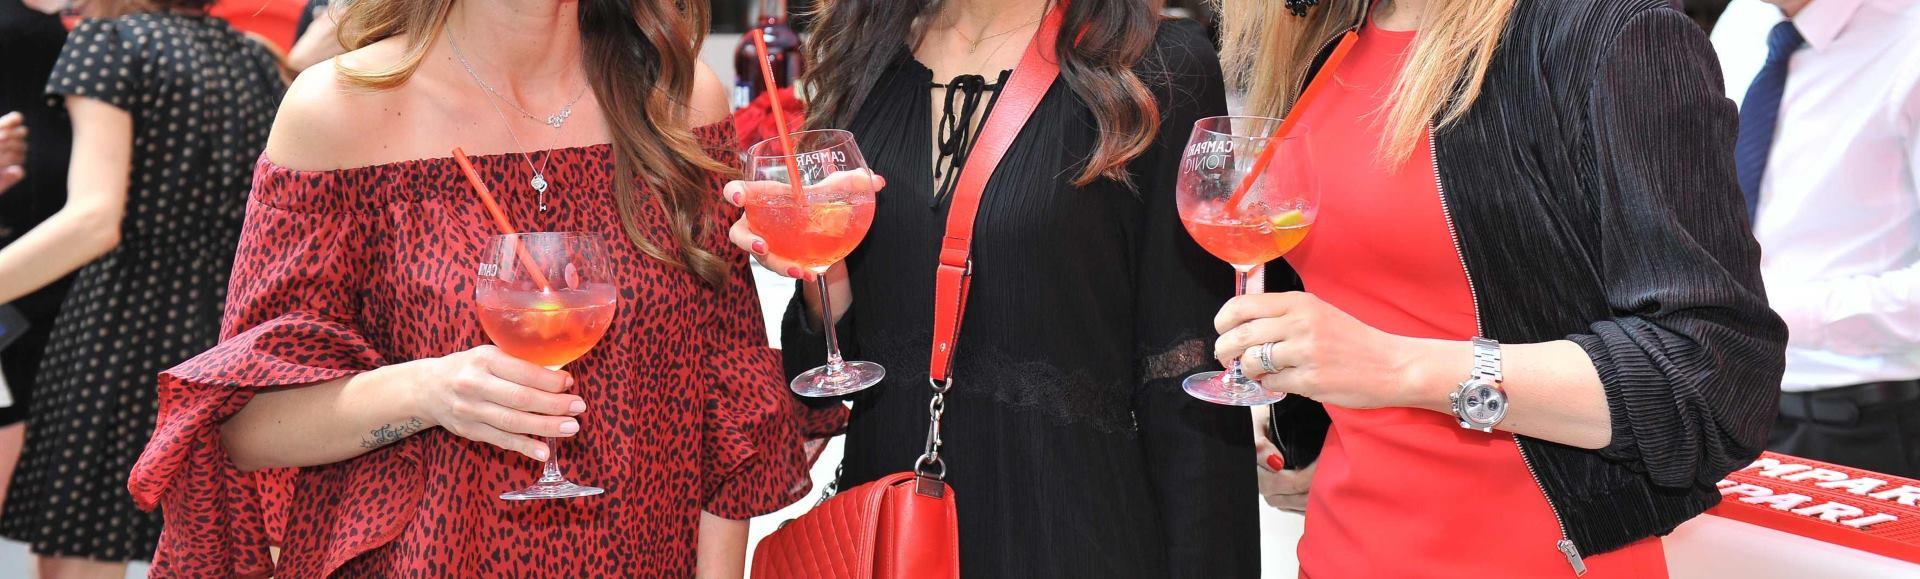 FOTO: Talijanska crvena elegancija stigla u Zagreb